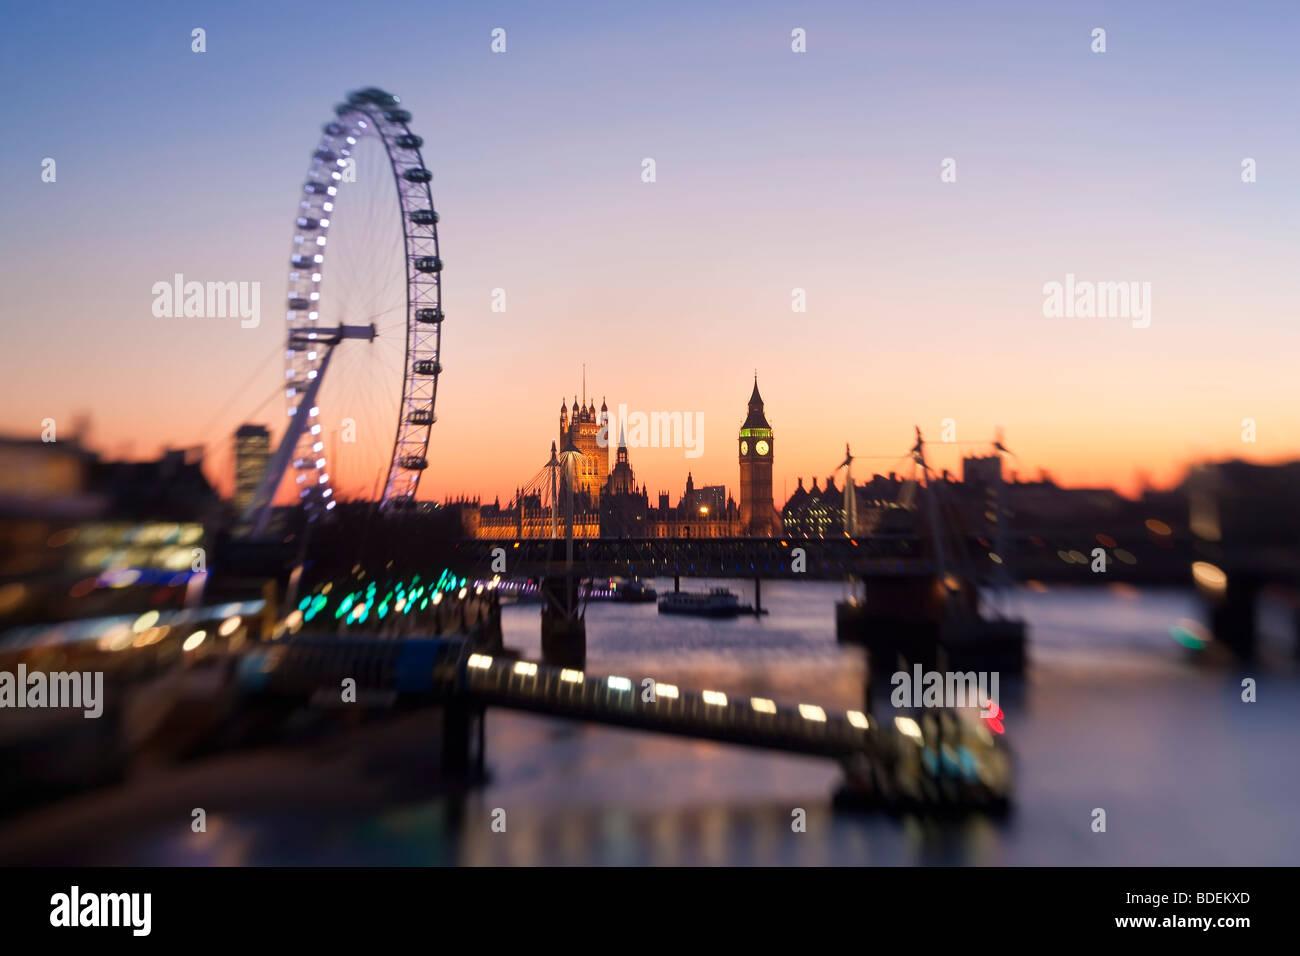 Chambres du Parlement et le London Eye, Westminster, London, UK Photo Stock